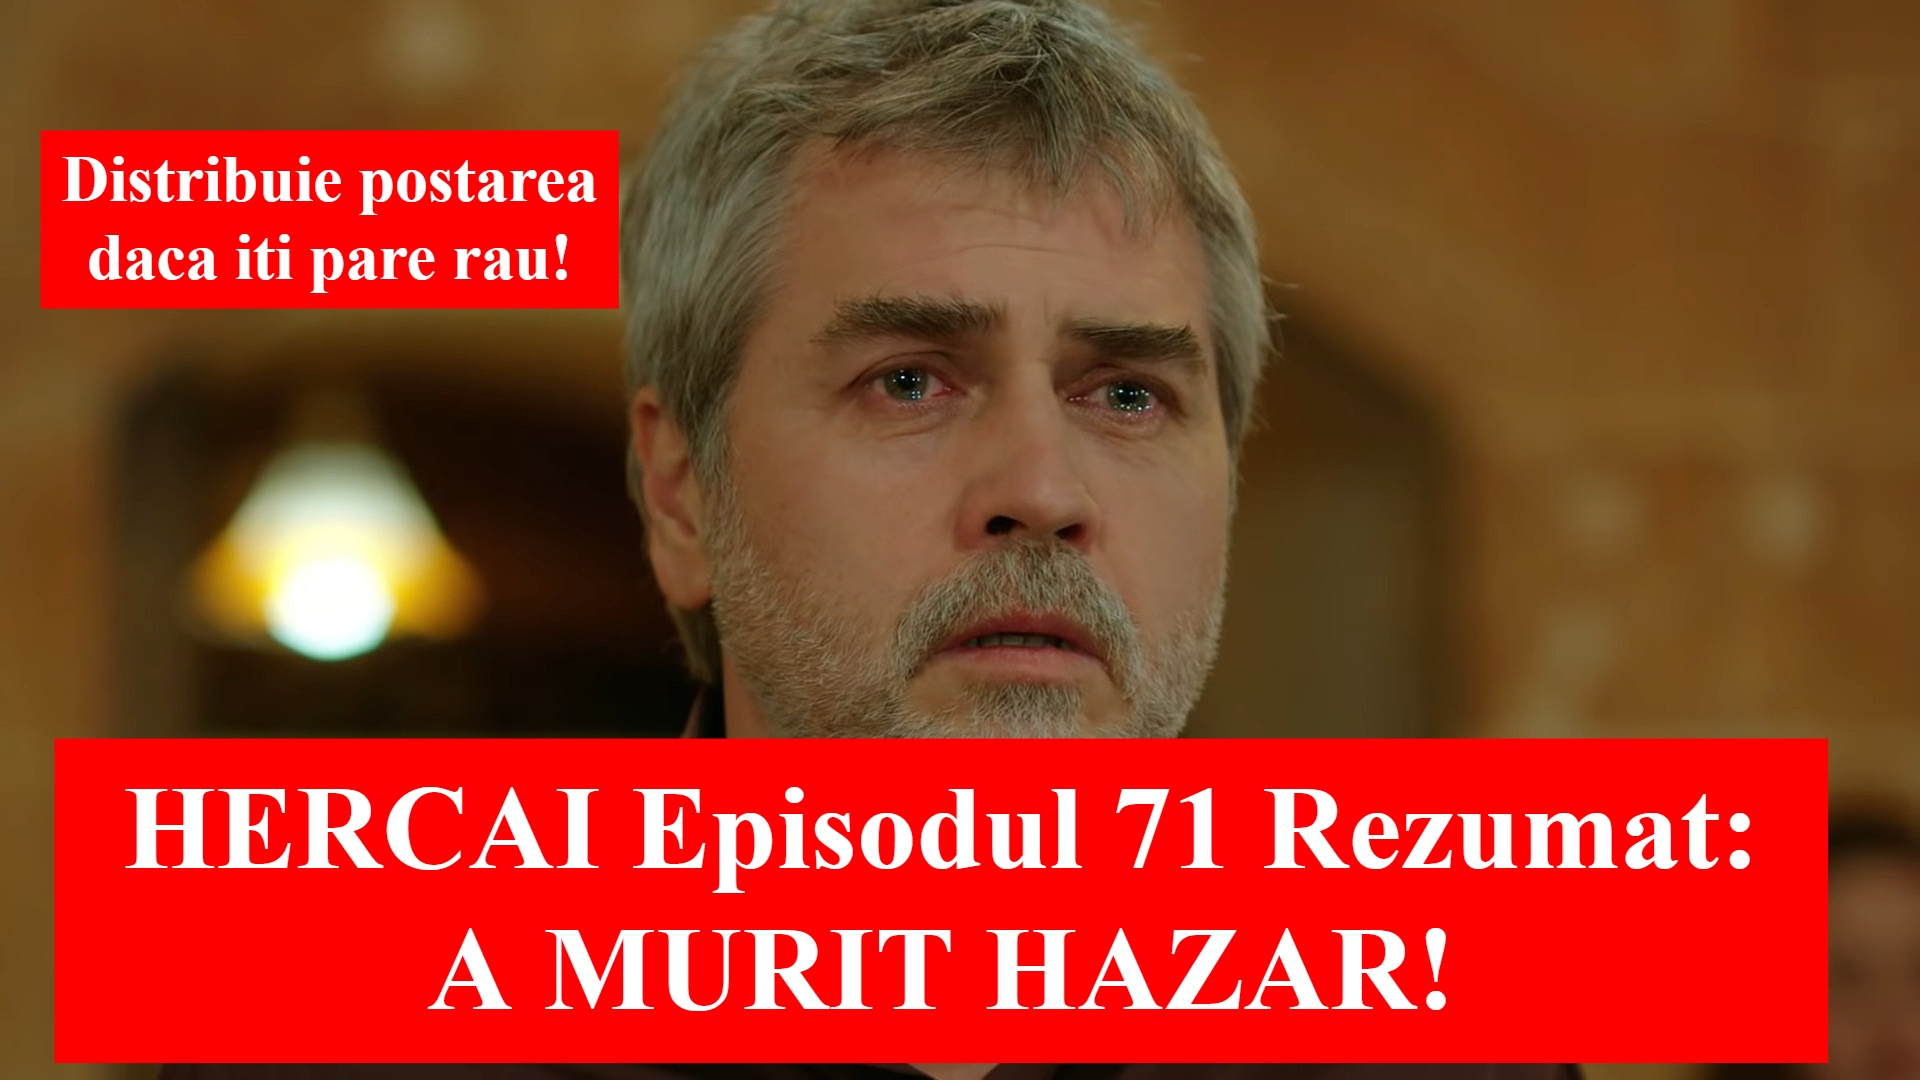 Hercai Episodul 71 Rezumat